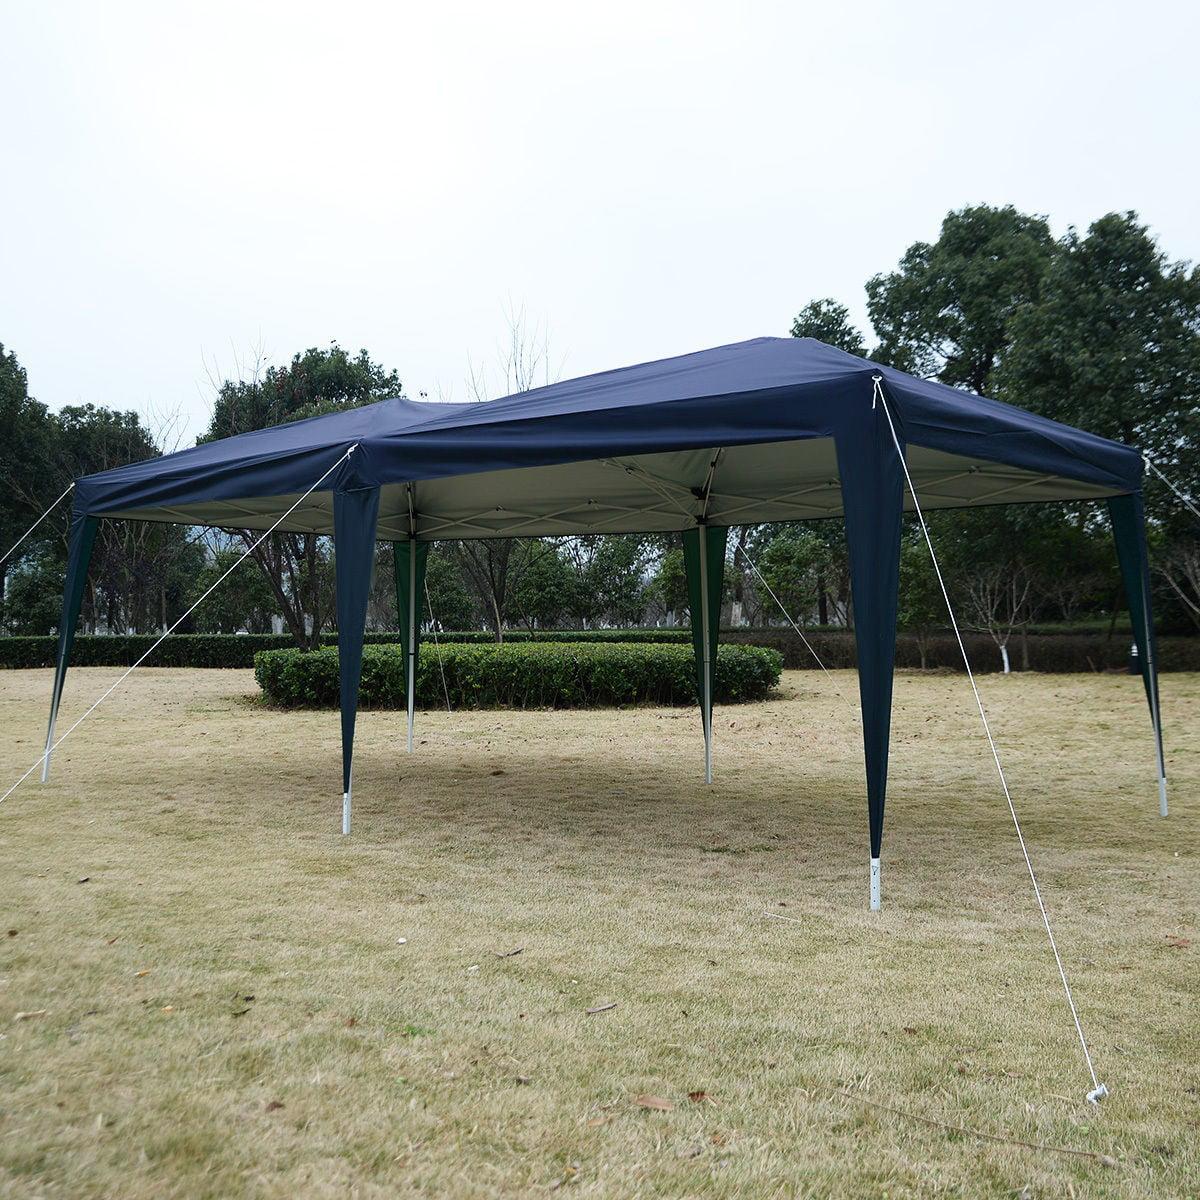 Apontus Outdoor Easy Pop Up Tent Cabana Canopy Gazebo with Carry Bag 10